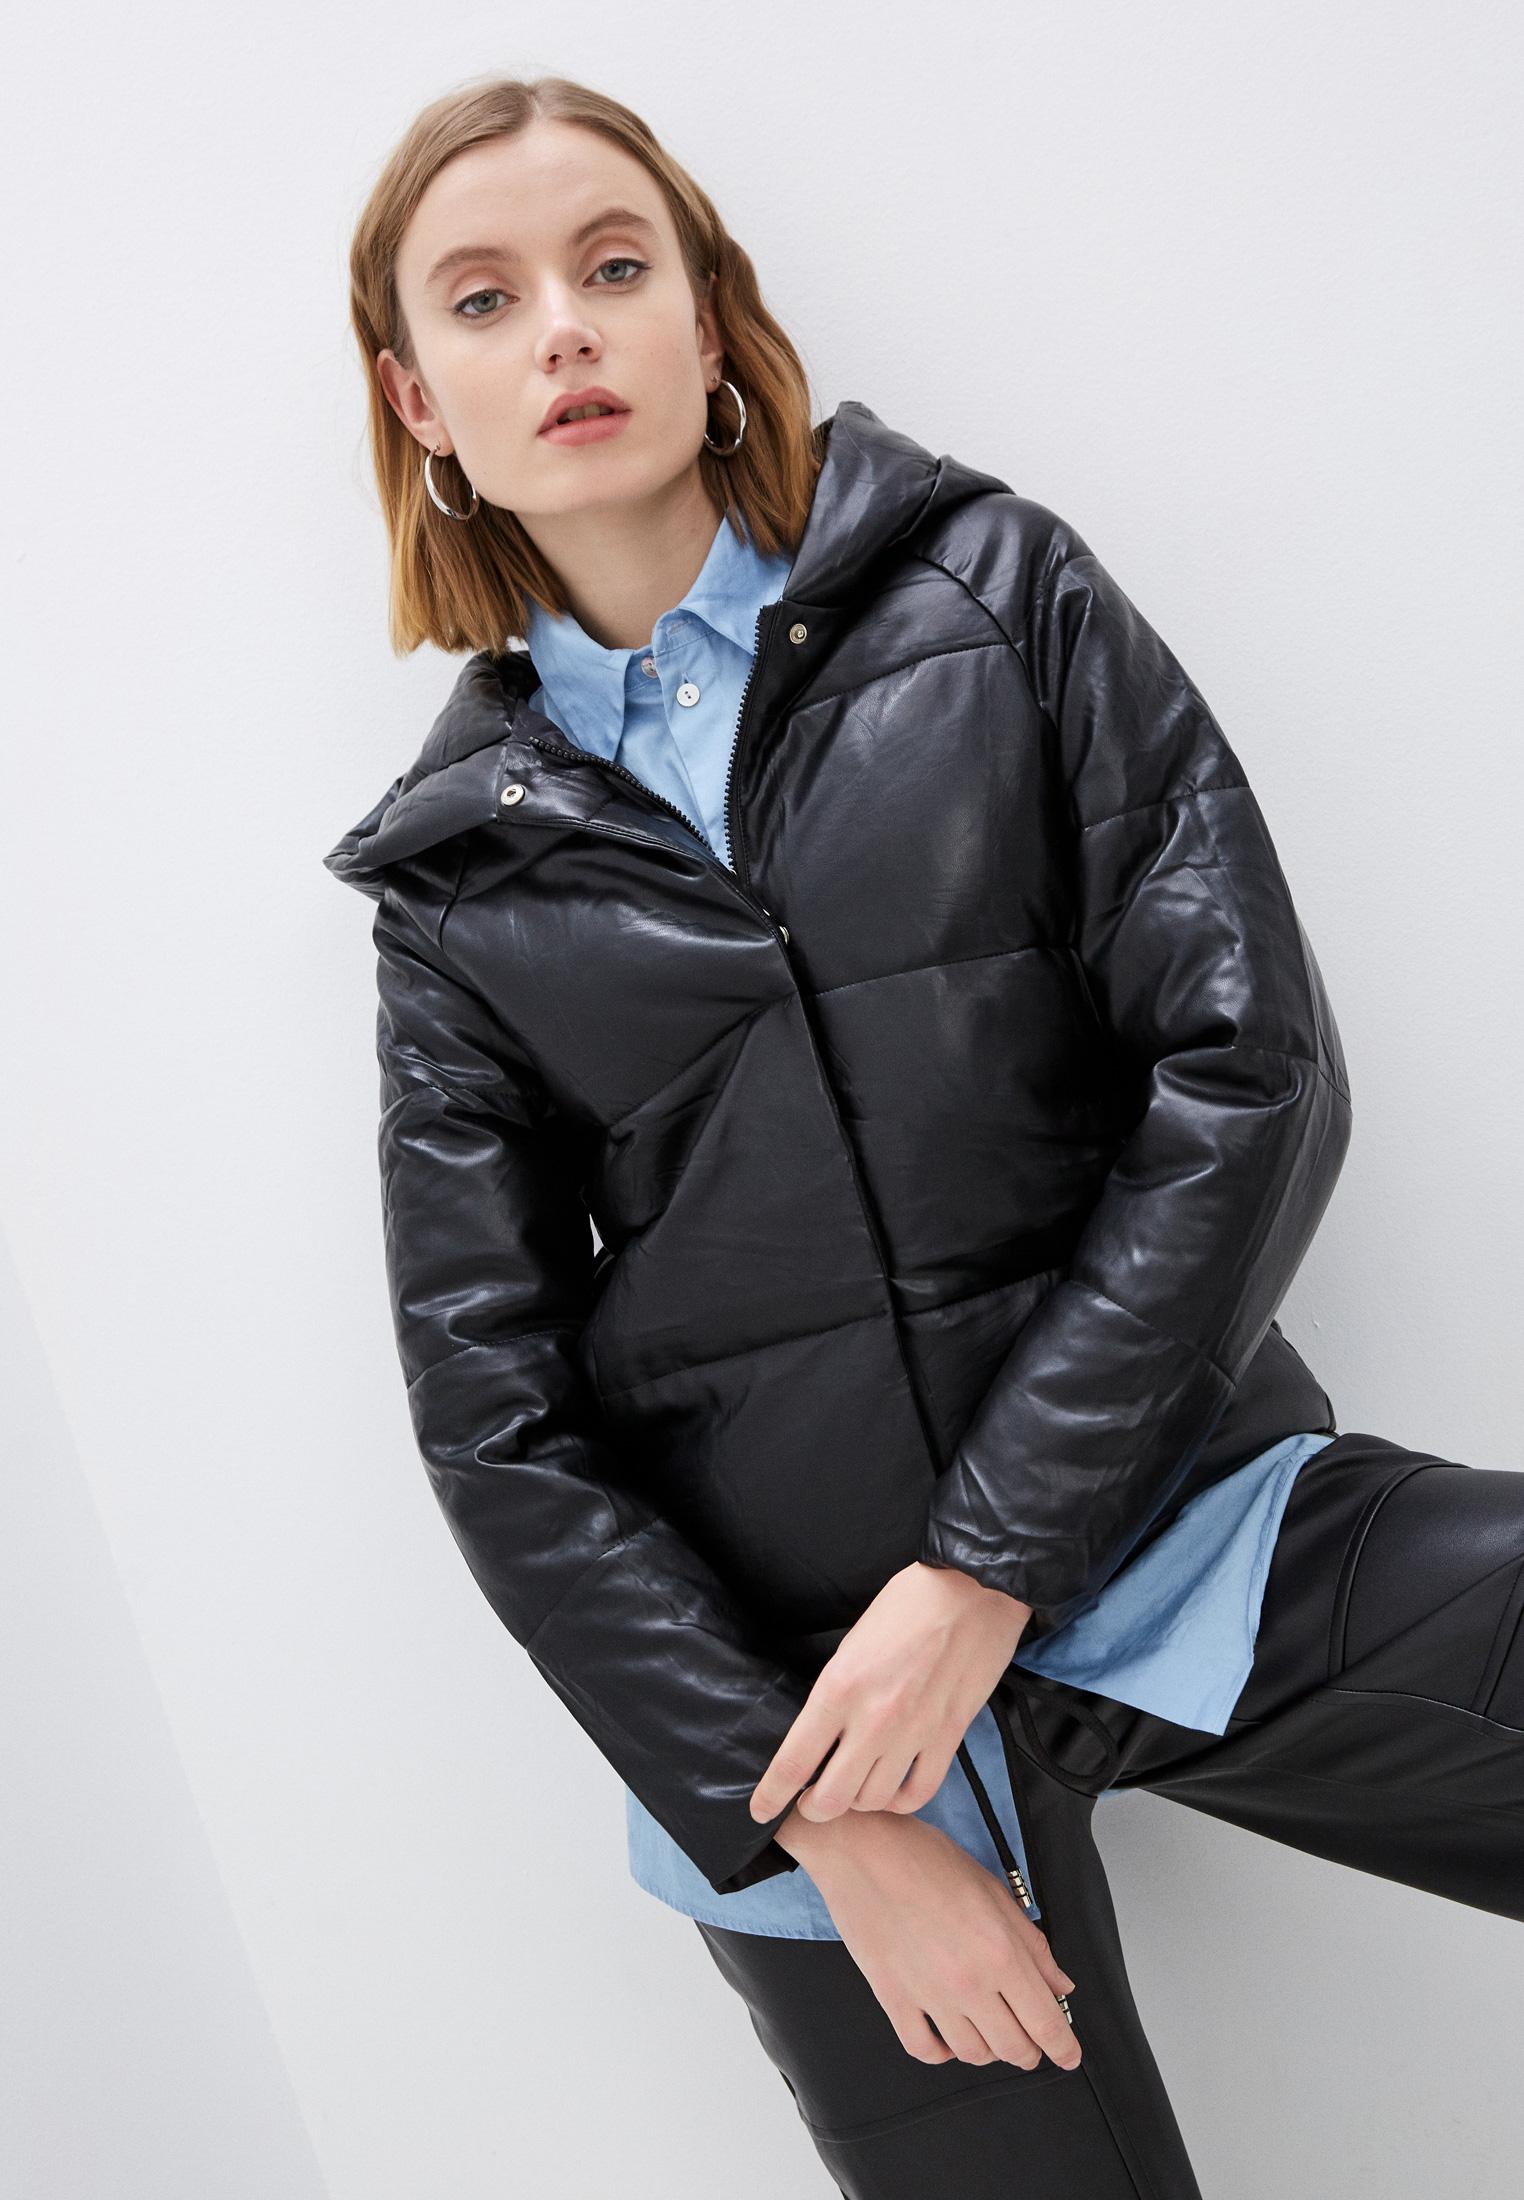 Кожаная куртка Snow Airwolf Куртка кожаная Snow Airwolf